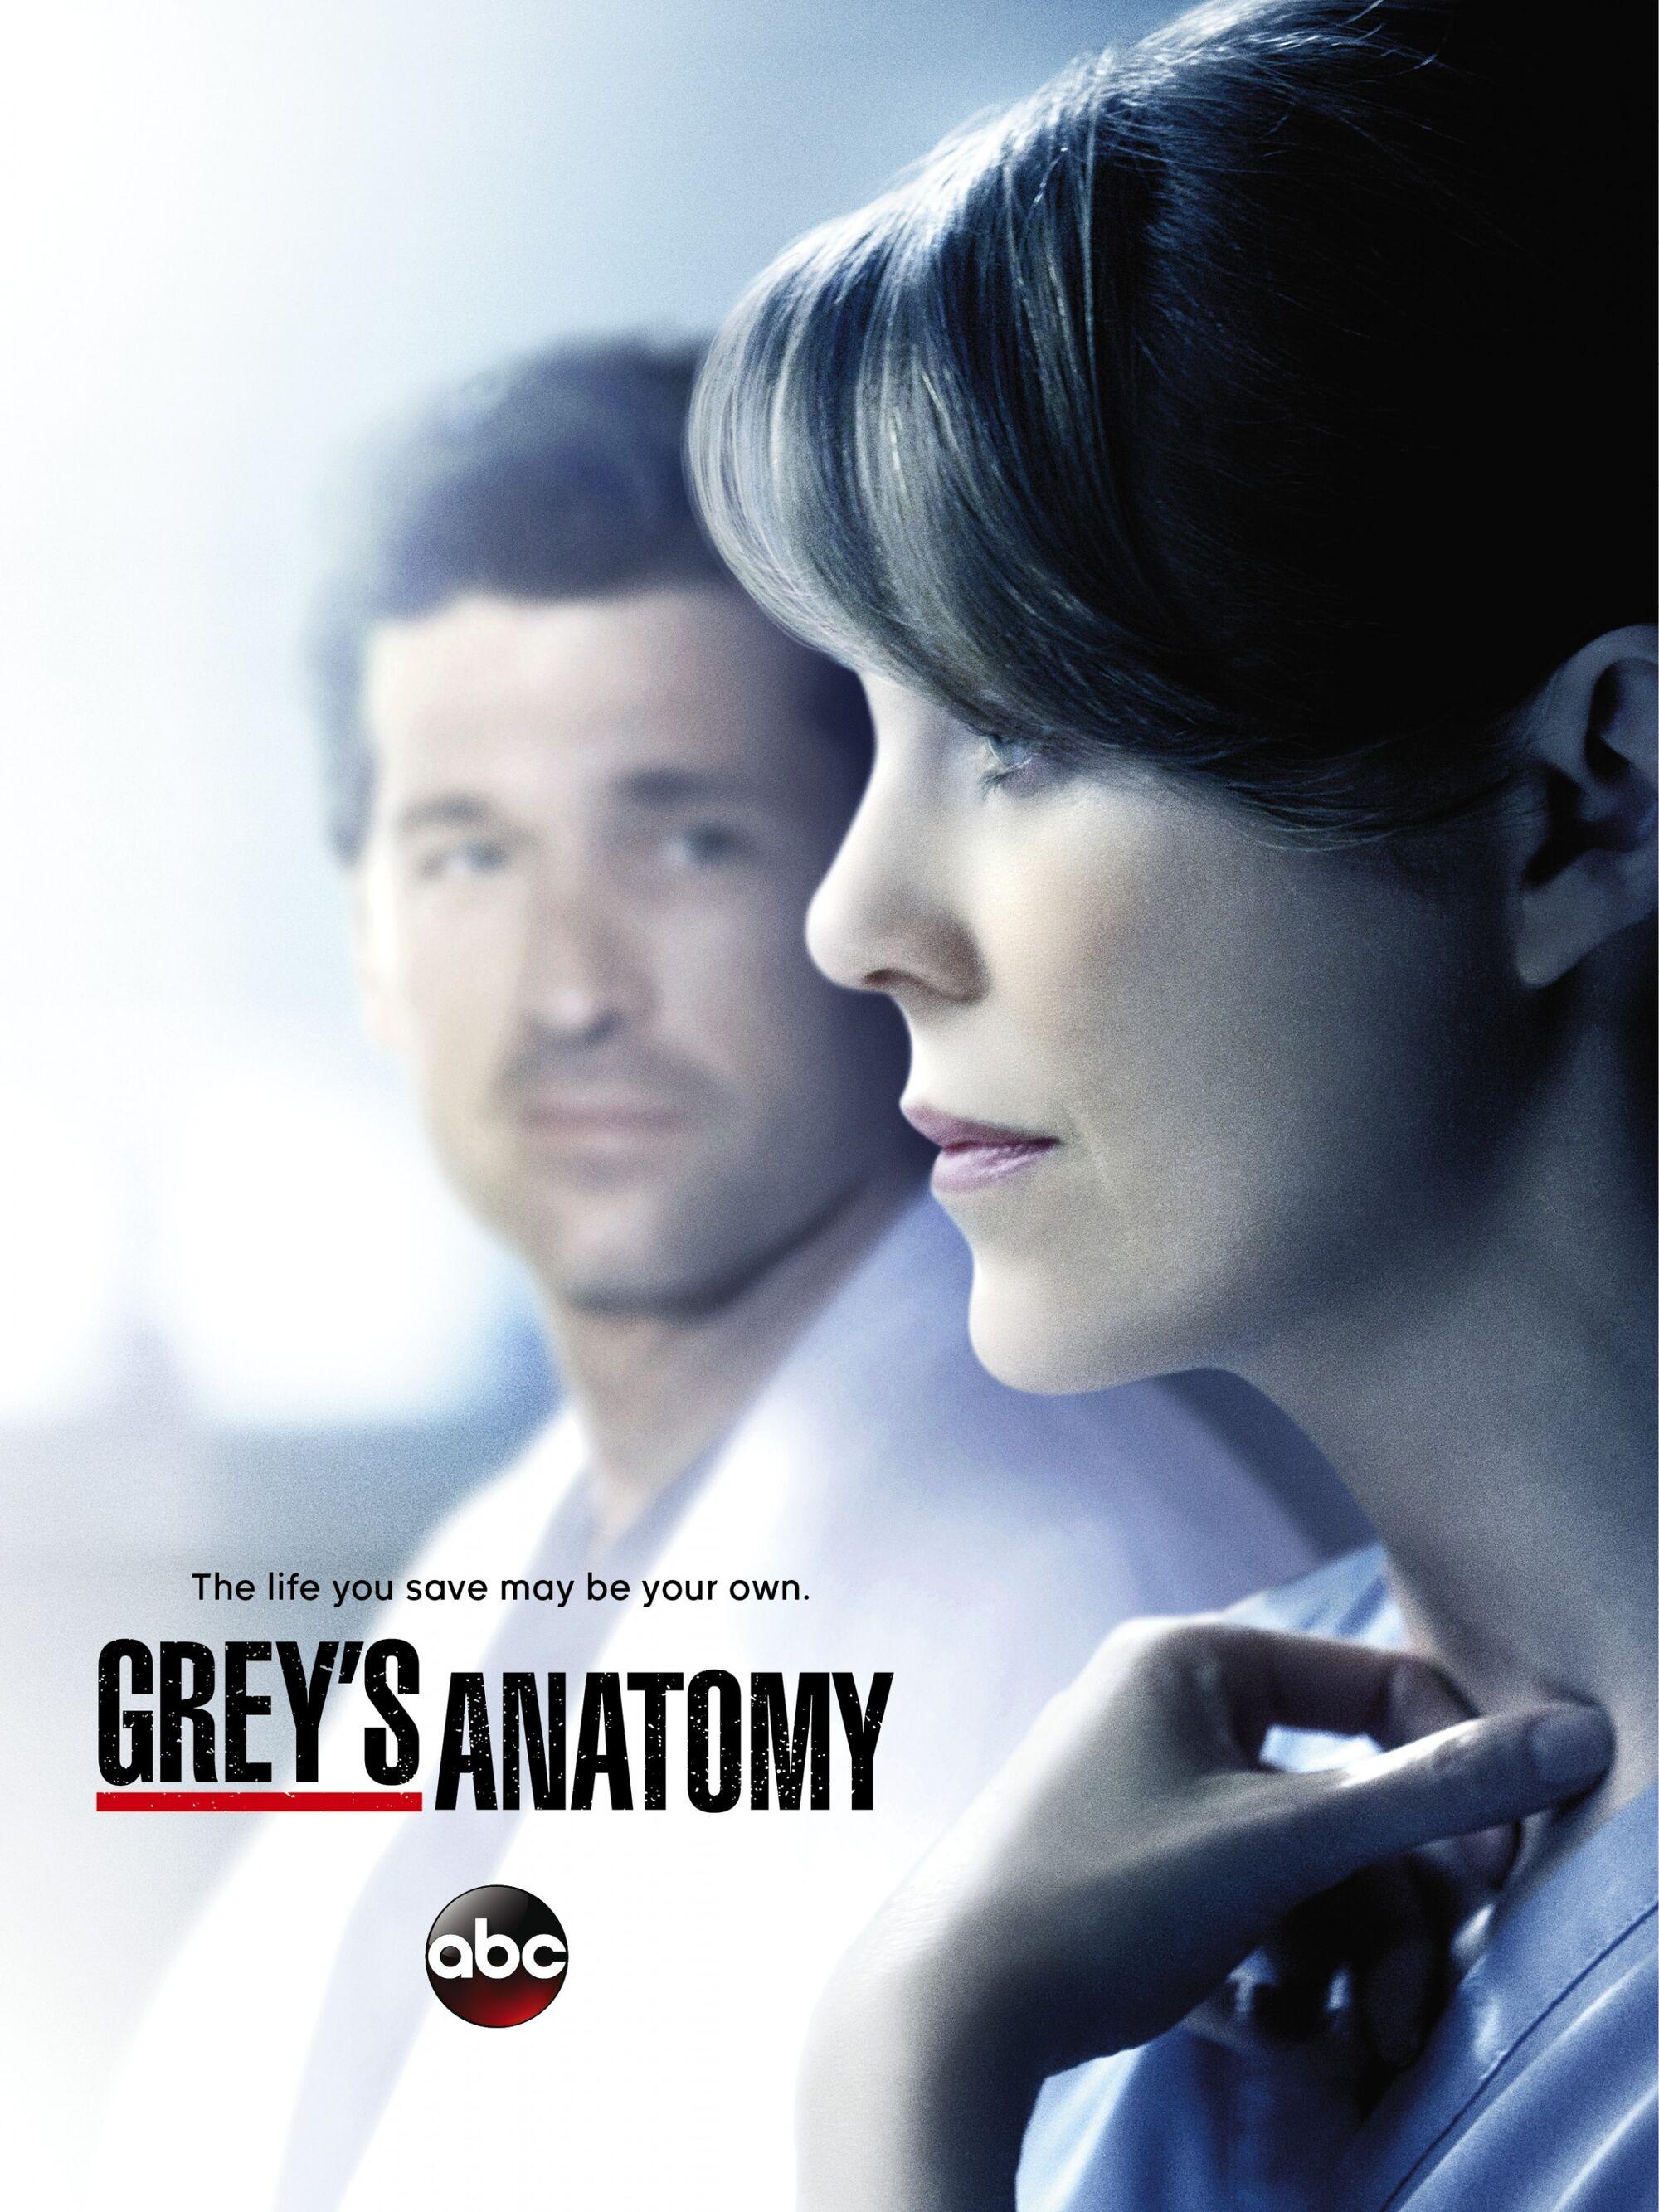 Greys anatomy episode guide wiki